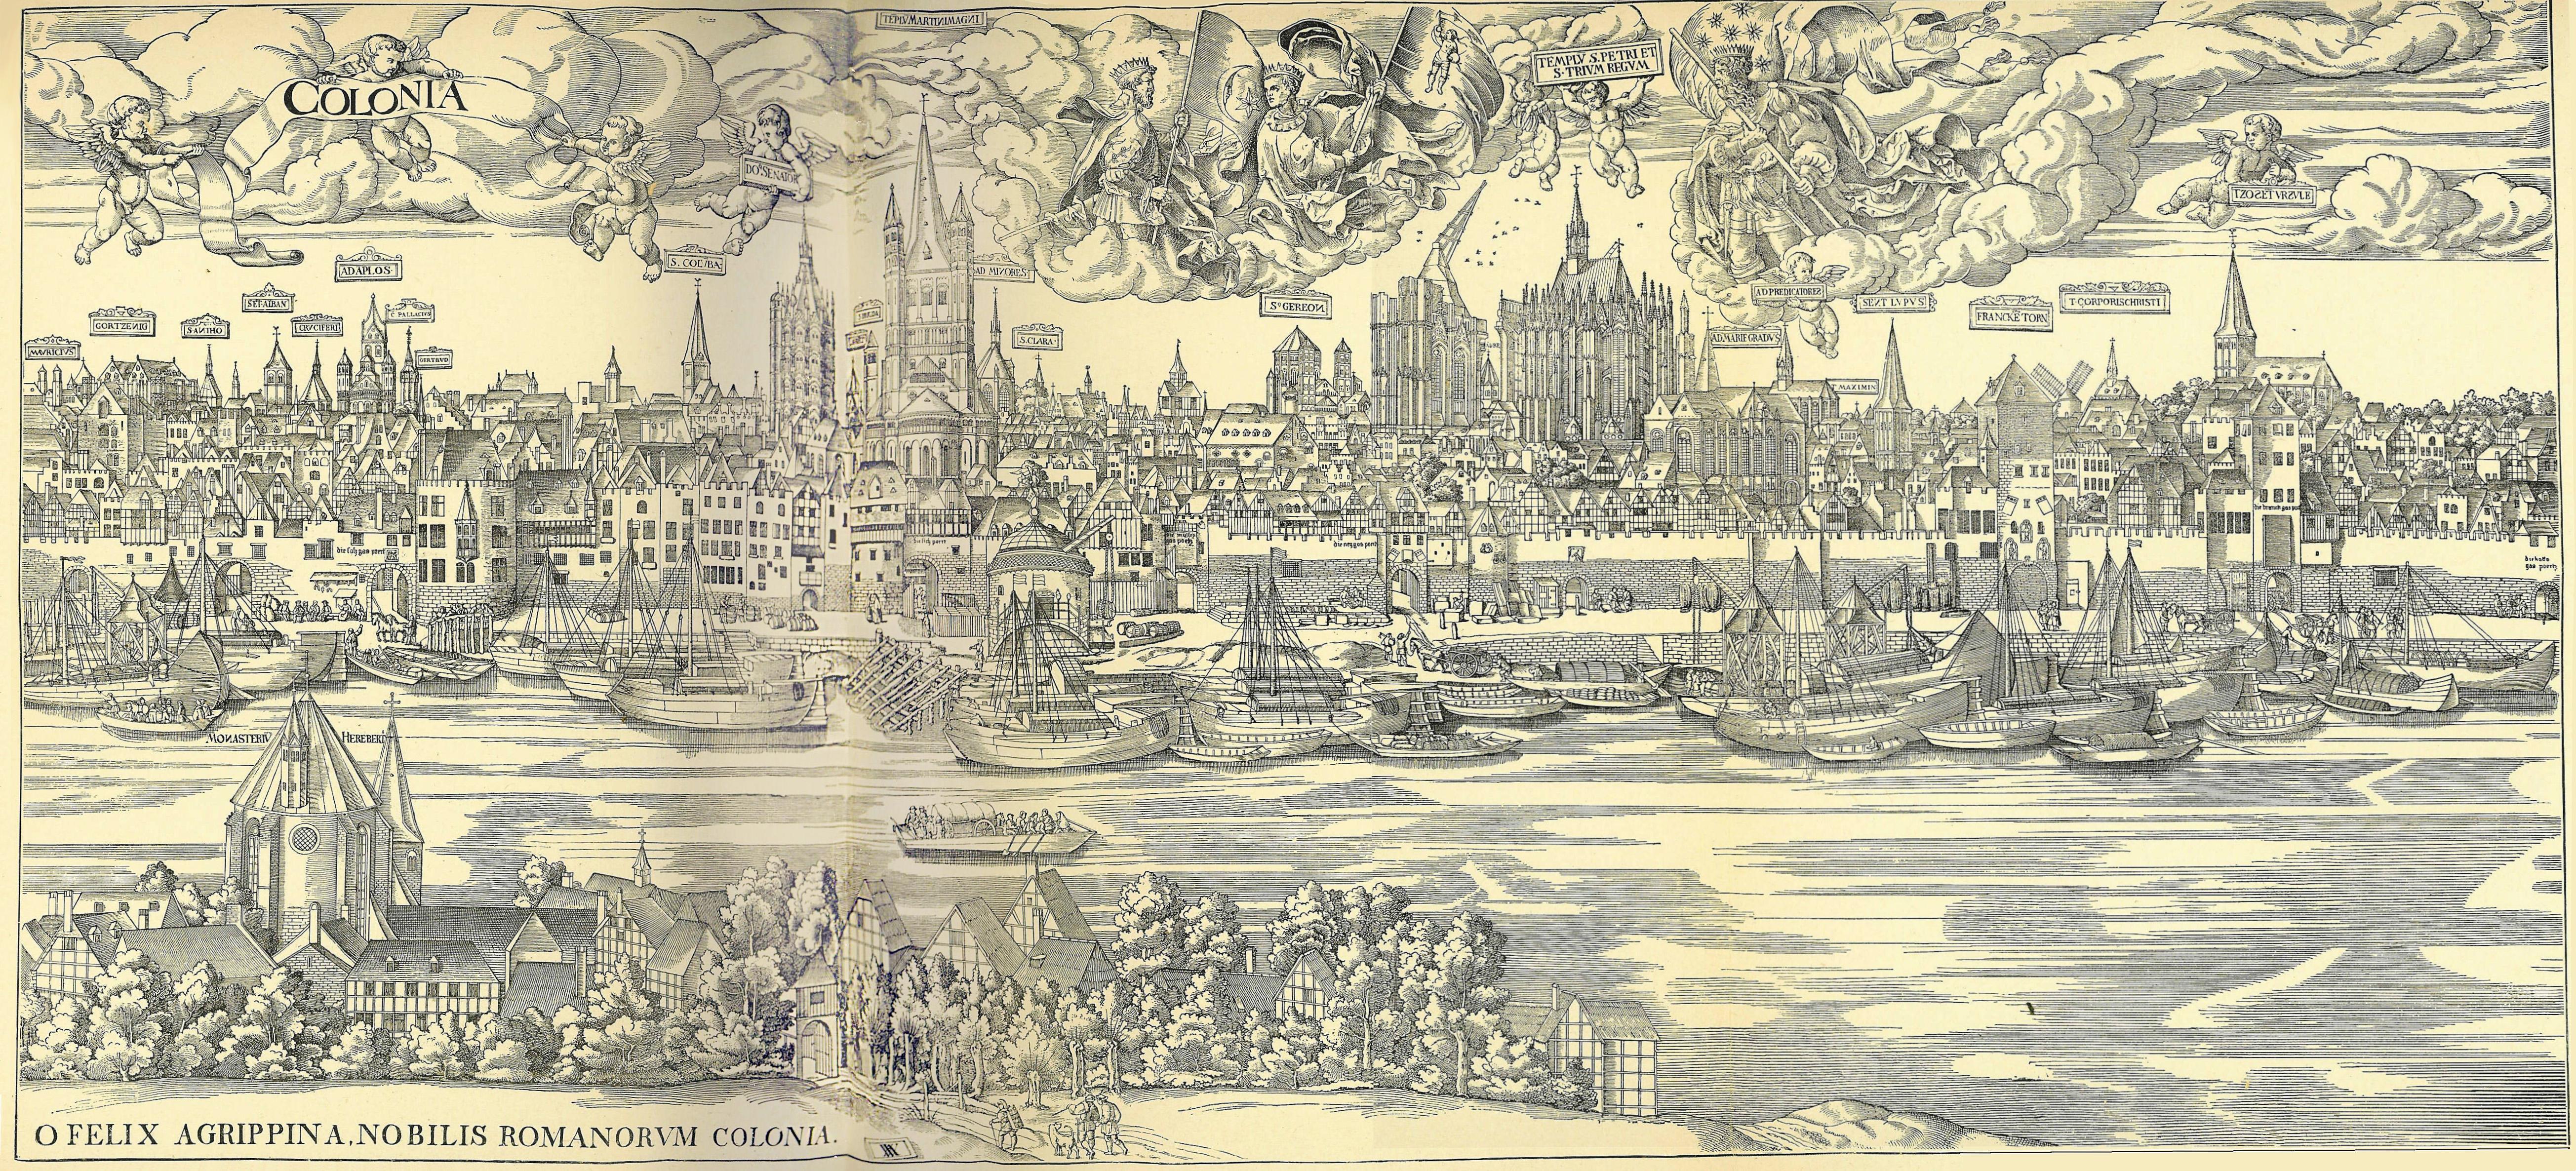 File:Cologne 1530 after Anton Woensam.jpg